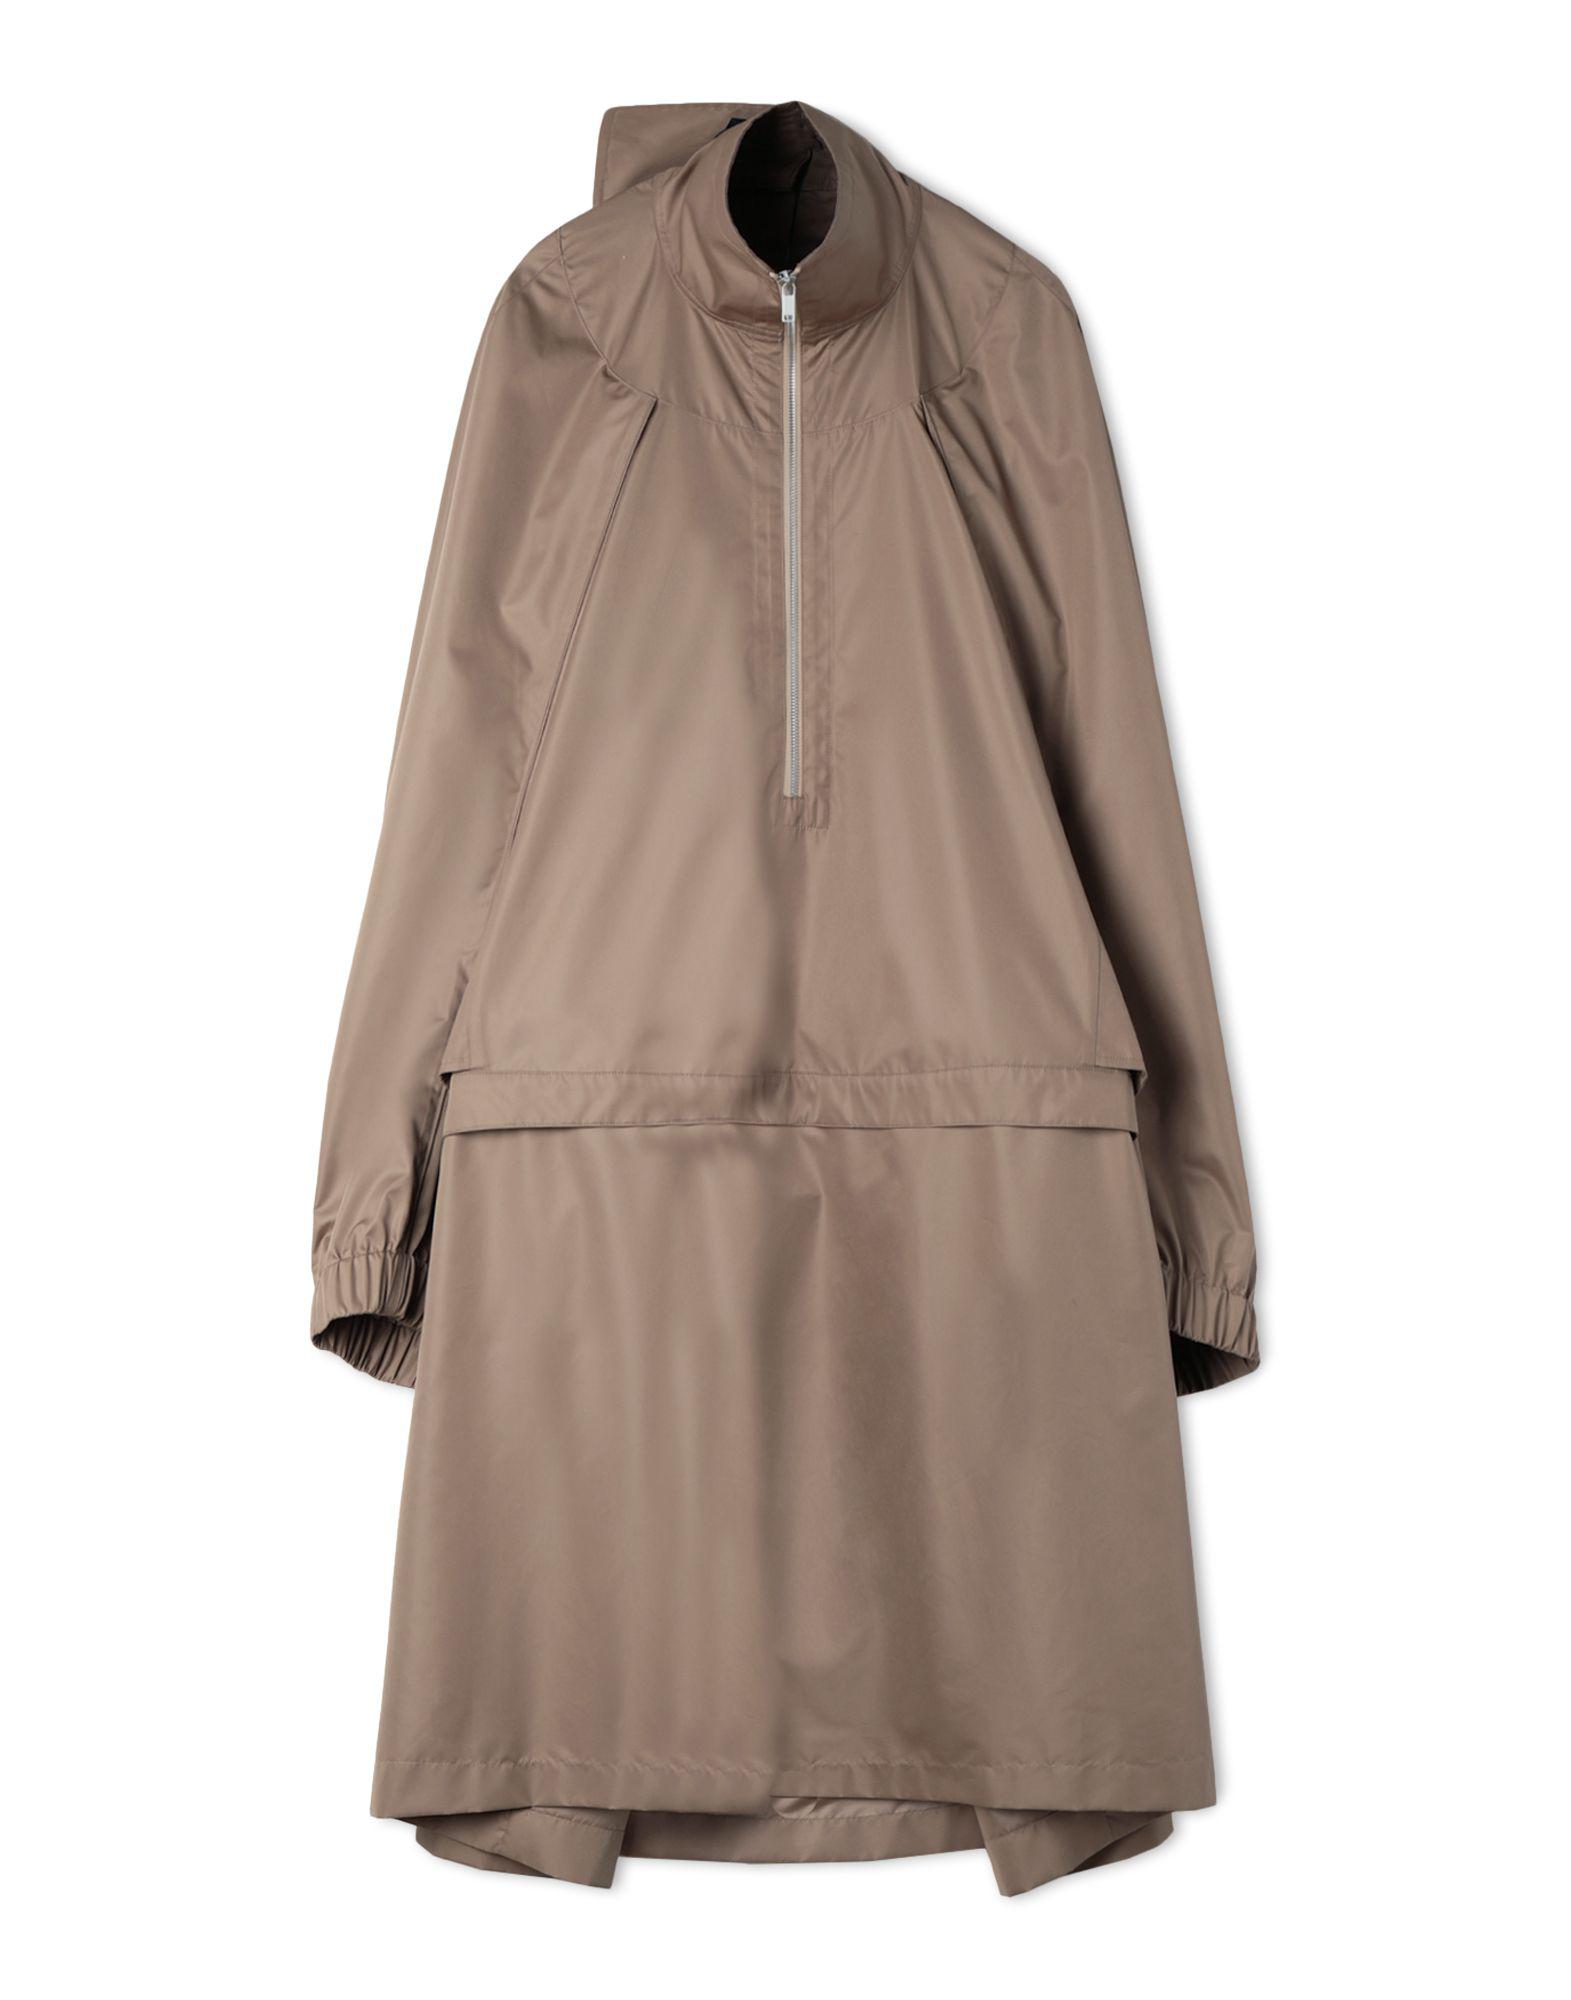 on sale a986e c8053 Coat - Brown